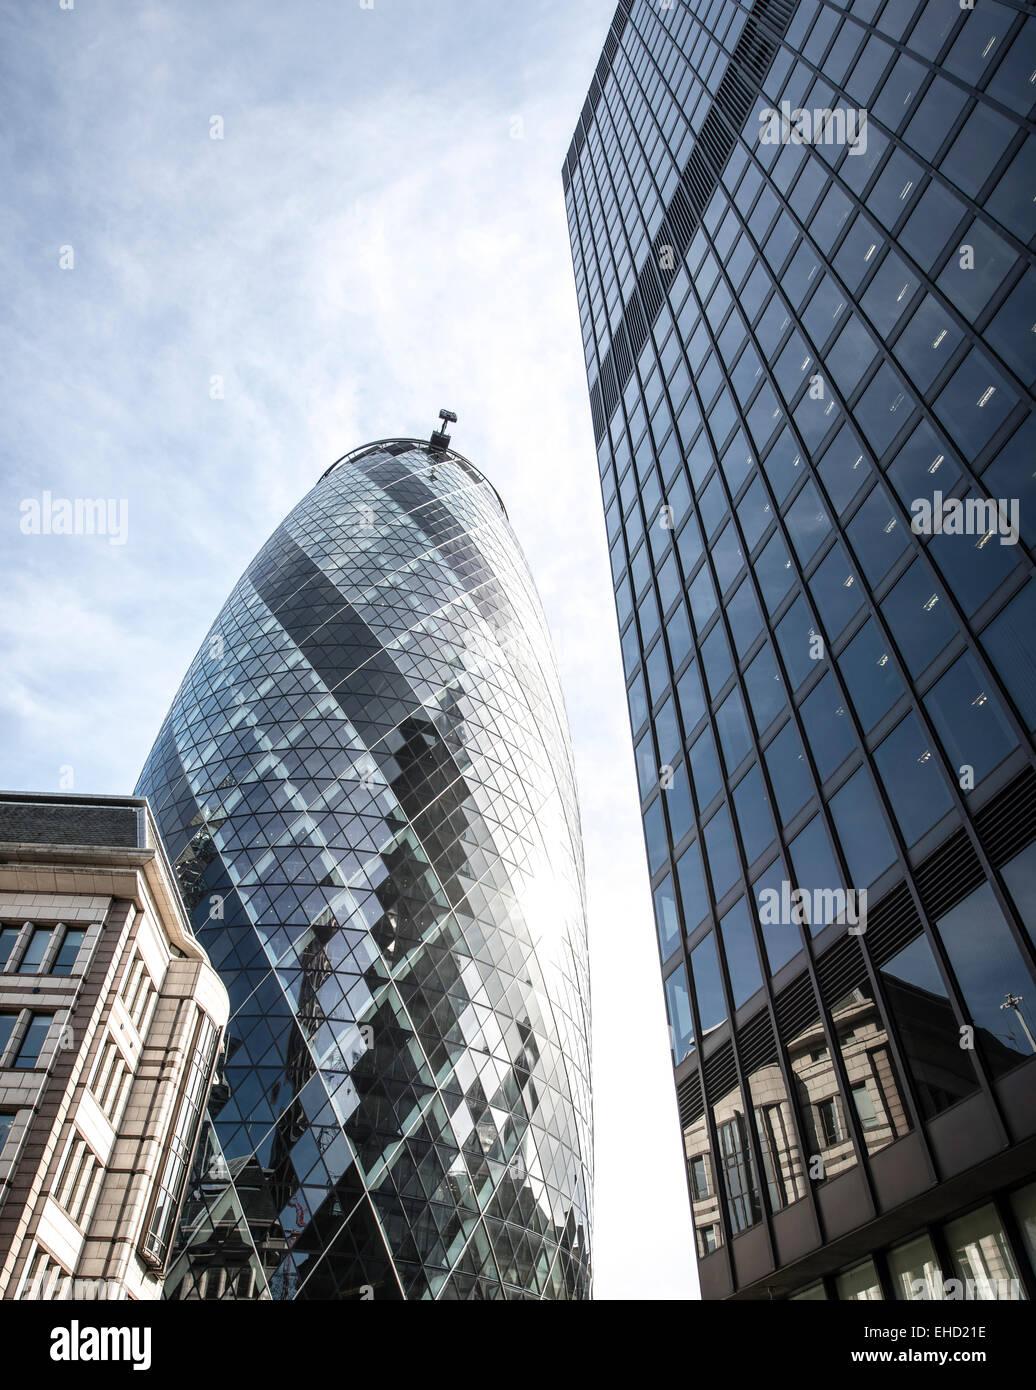 Le Gherkin, Londres Photo Stock